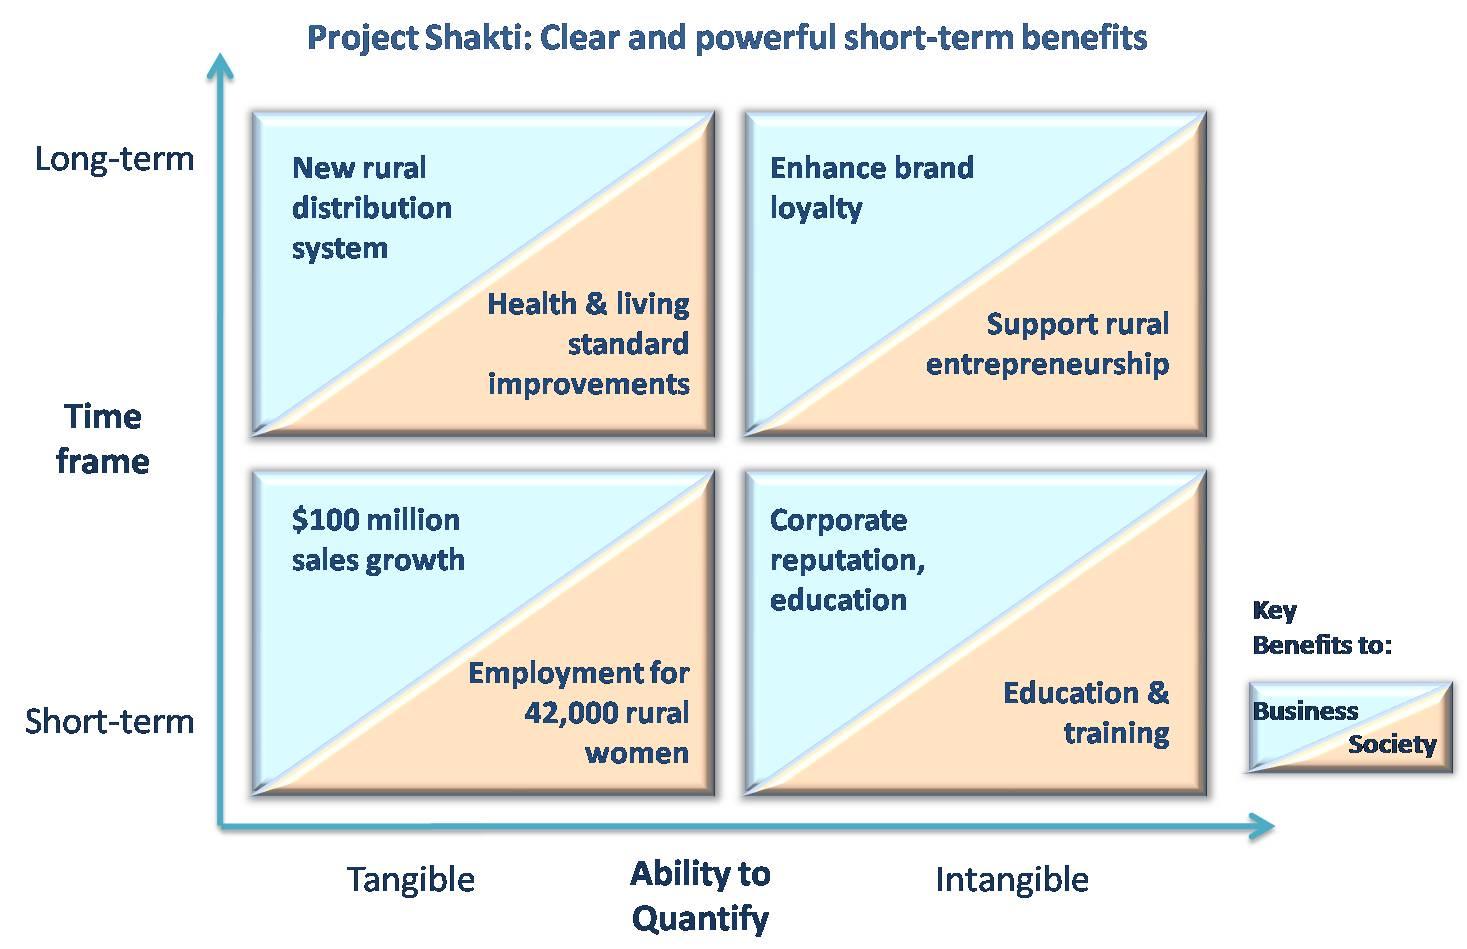 CSR_Exhibit_2_Shakti